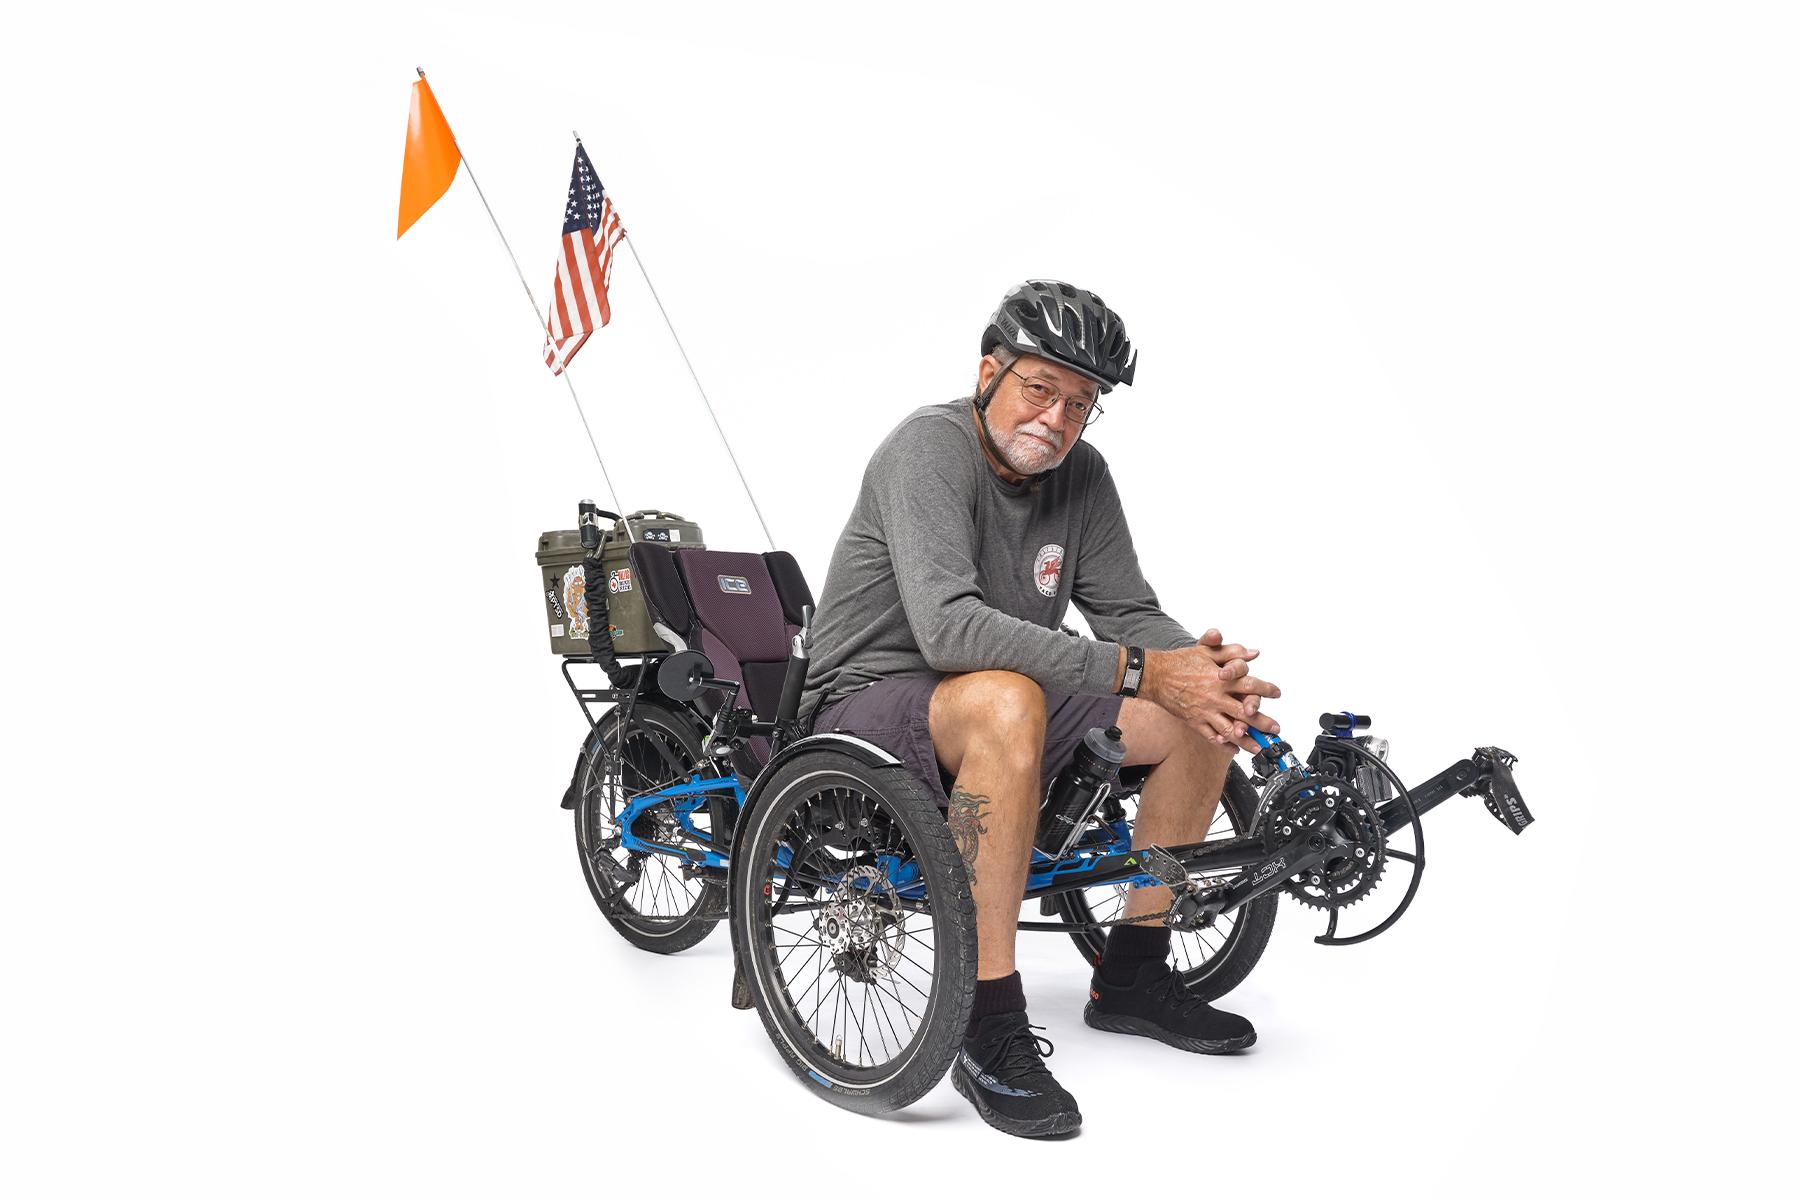 richard freeman dallas recumbent tricyclist